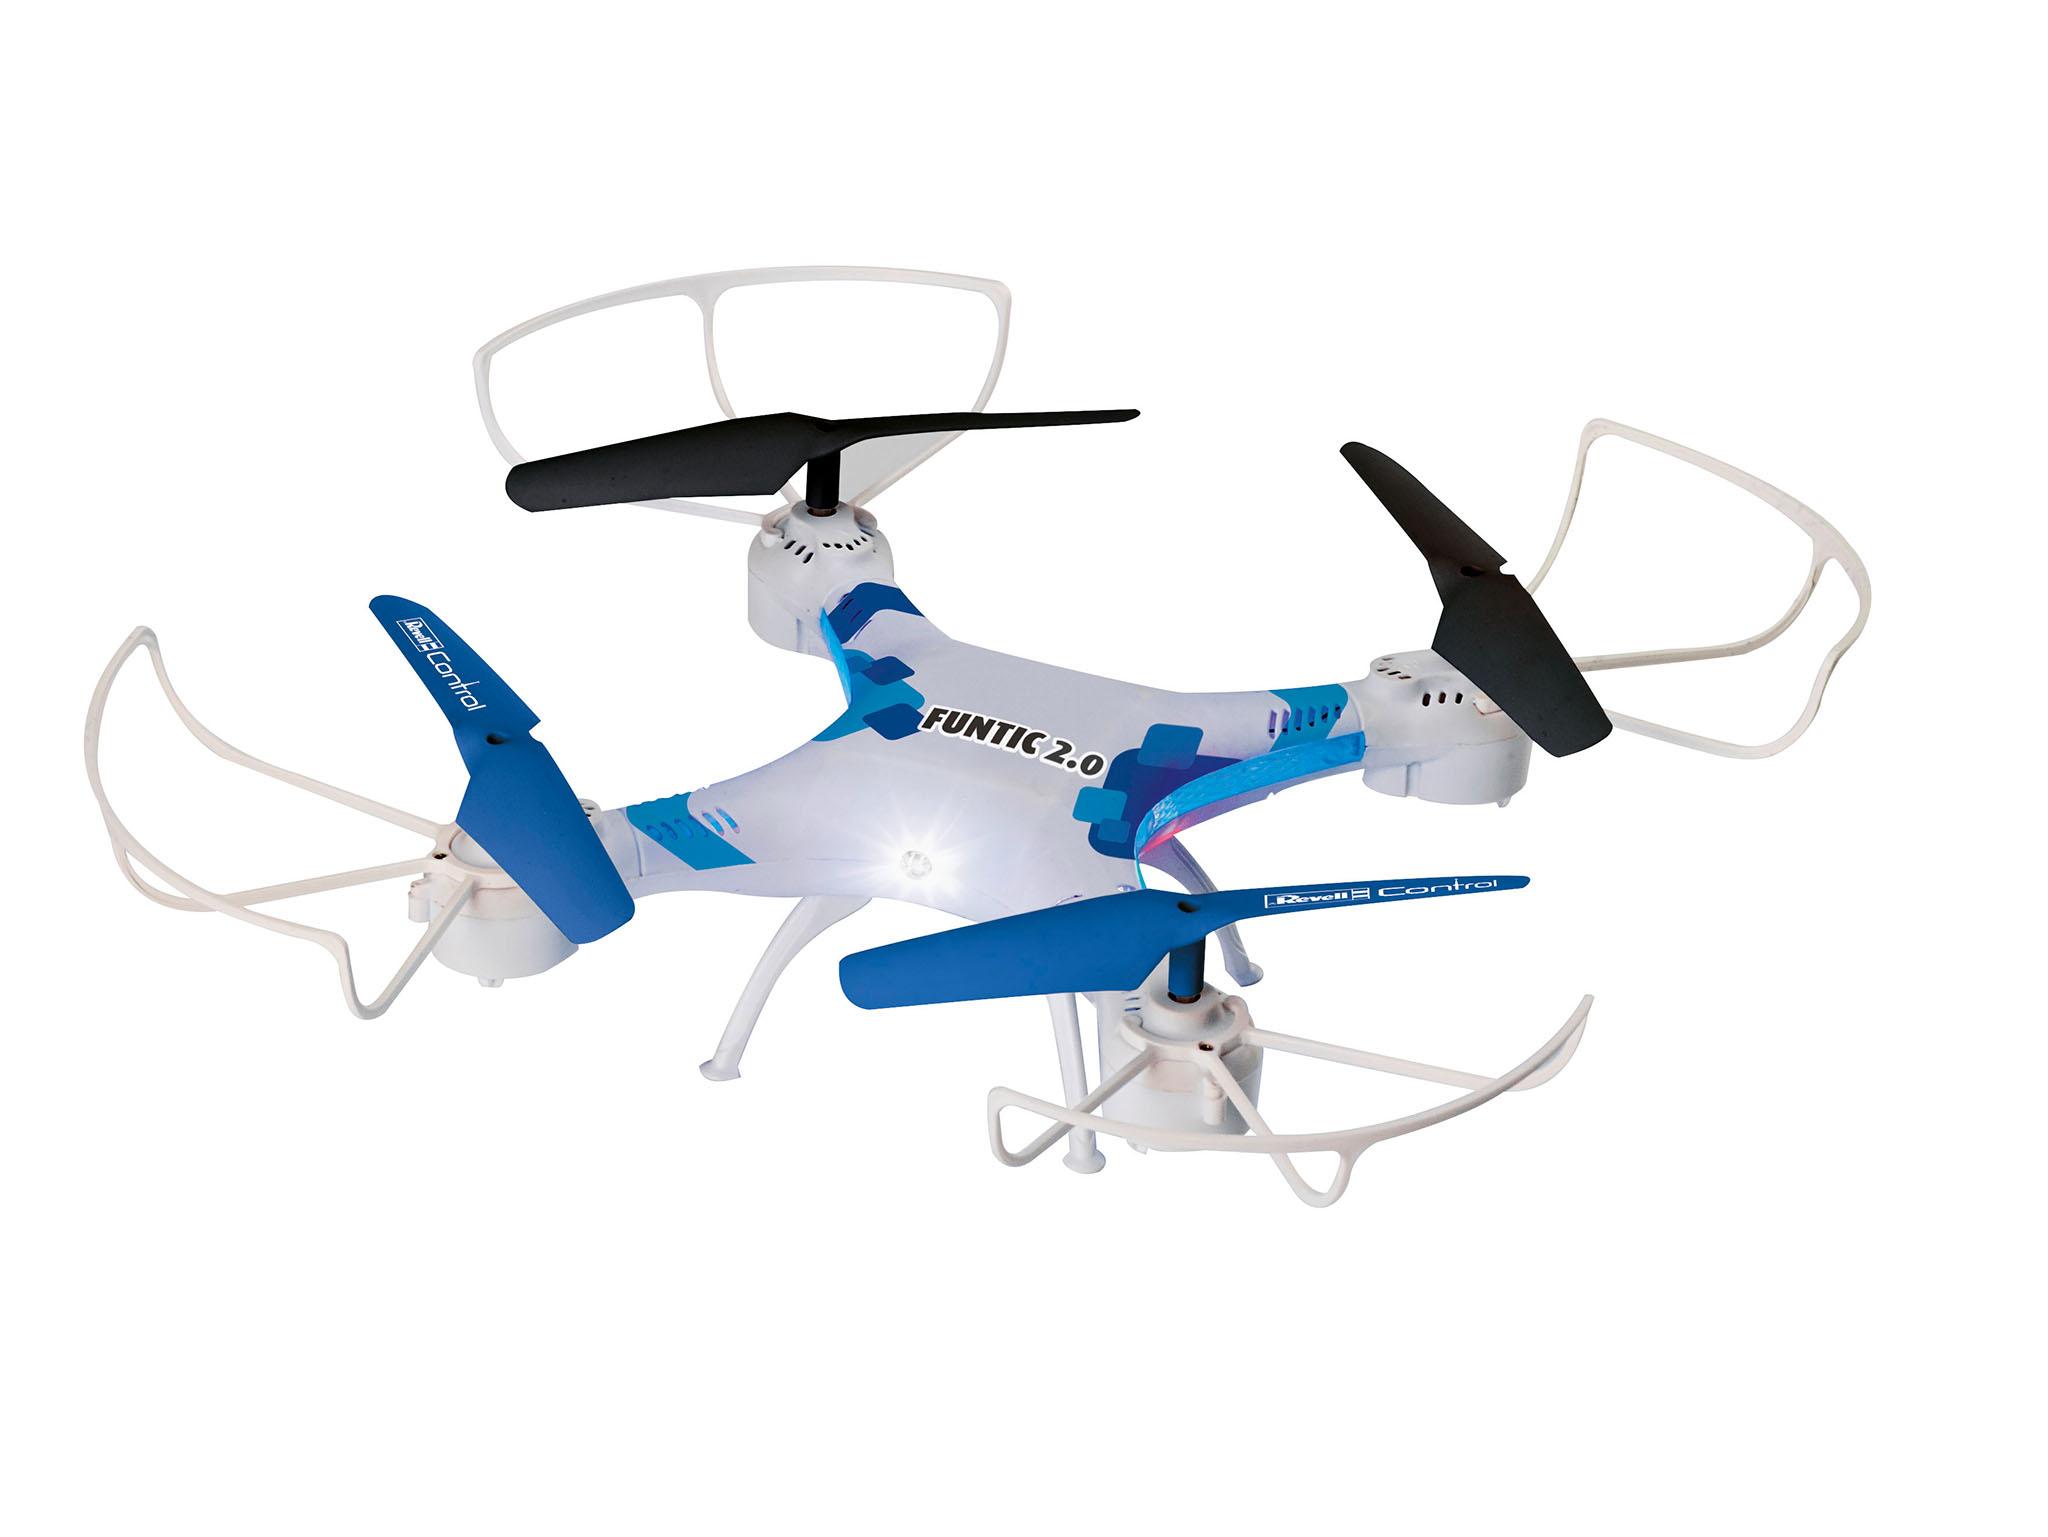 revell shop quadcopter funtic 2 0 revell shop. Black Bedroom Furniture Sets. Home Design Ideas